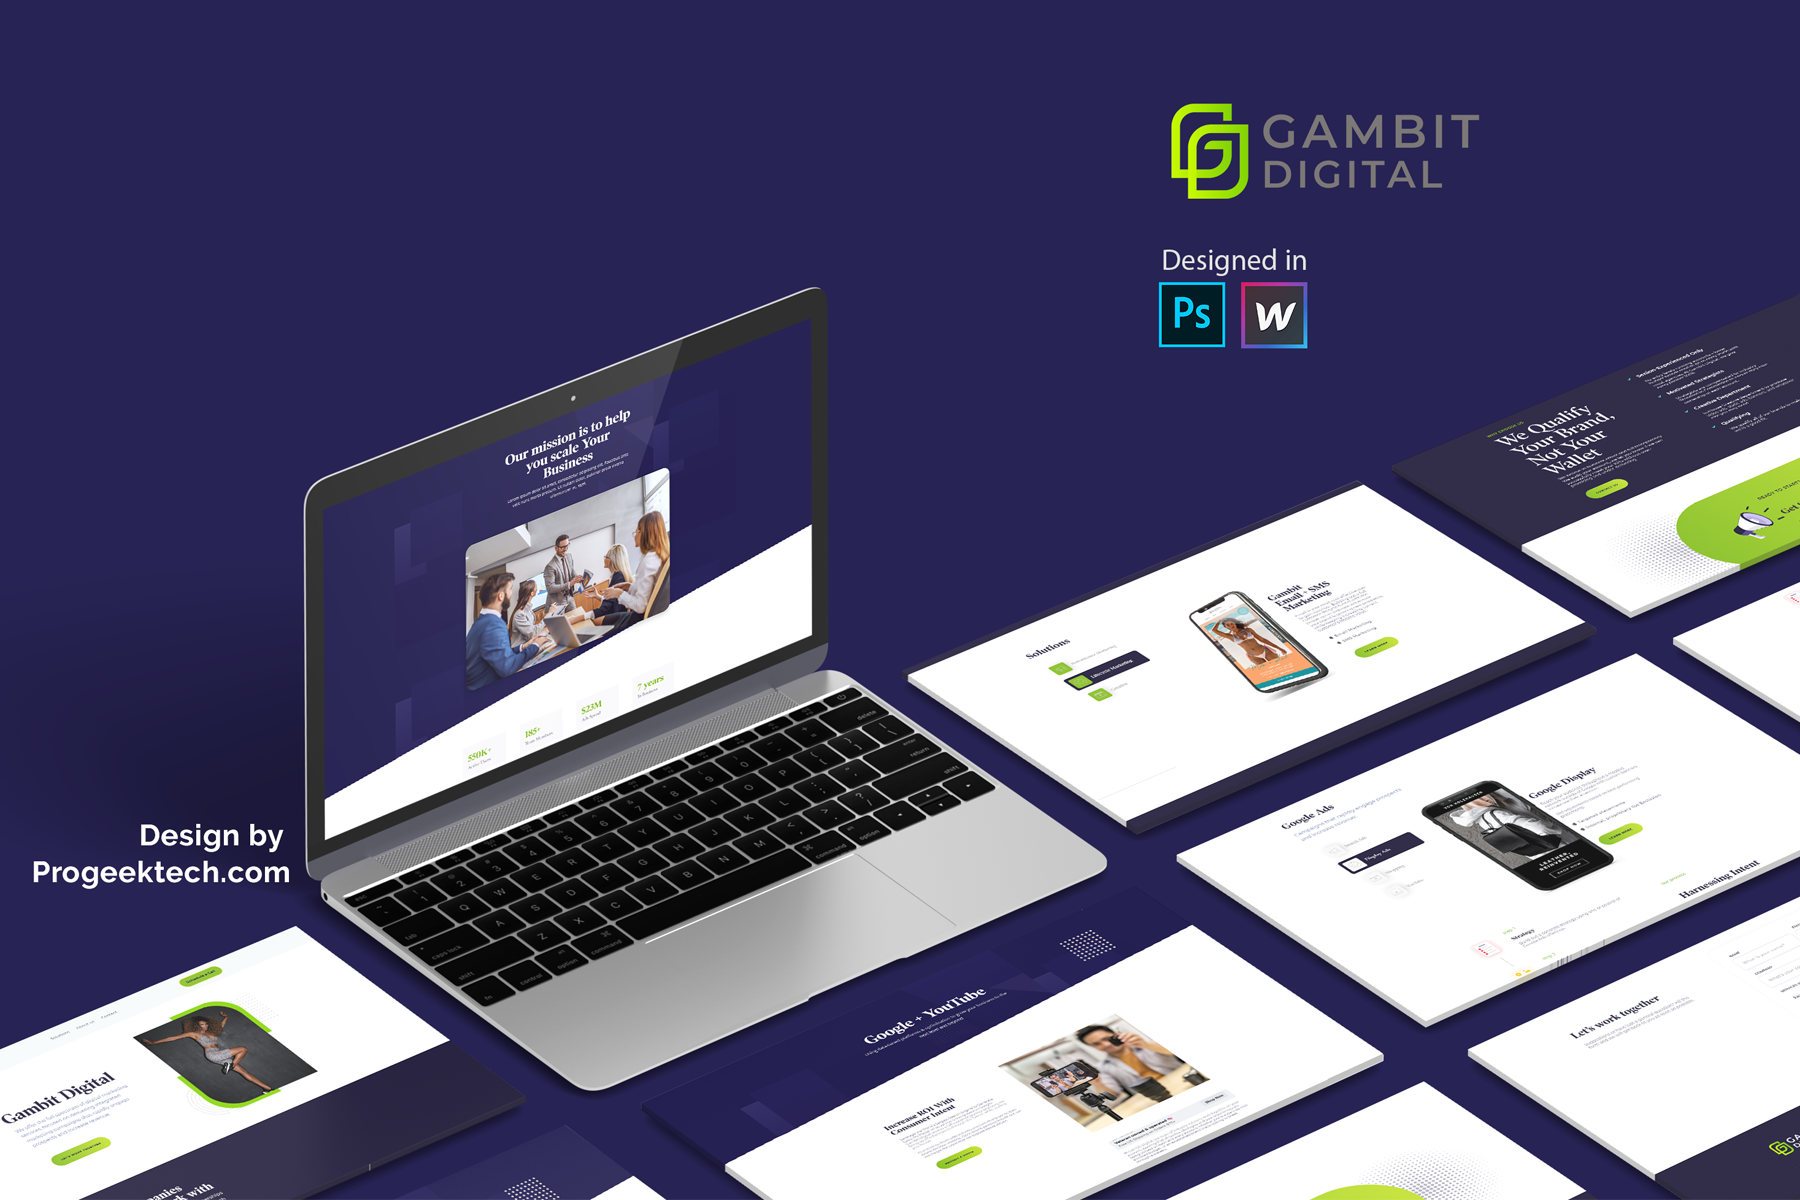 Gambit webflow design